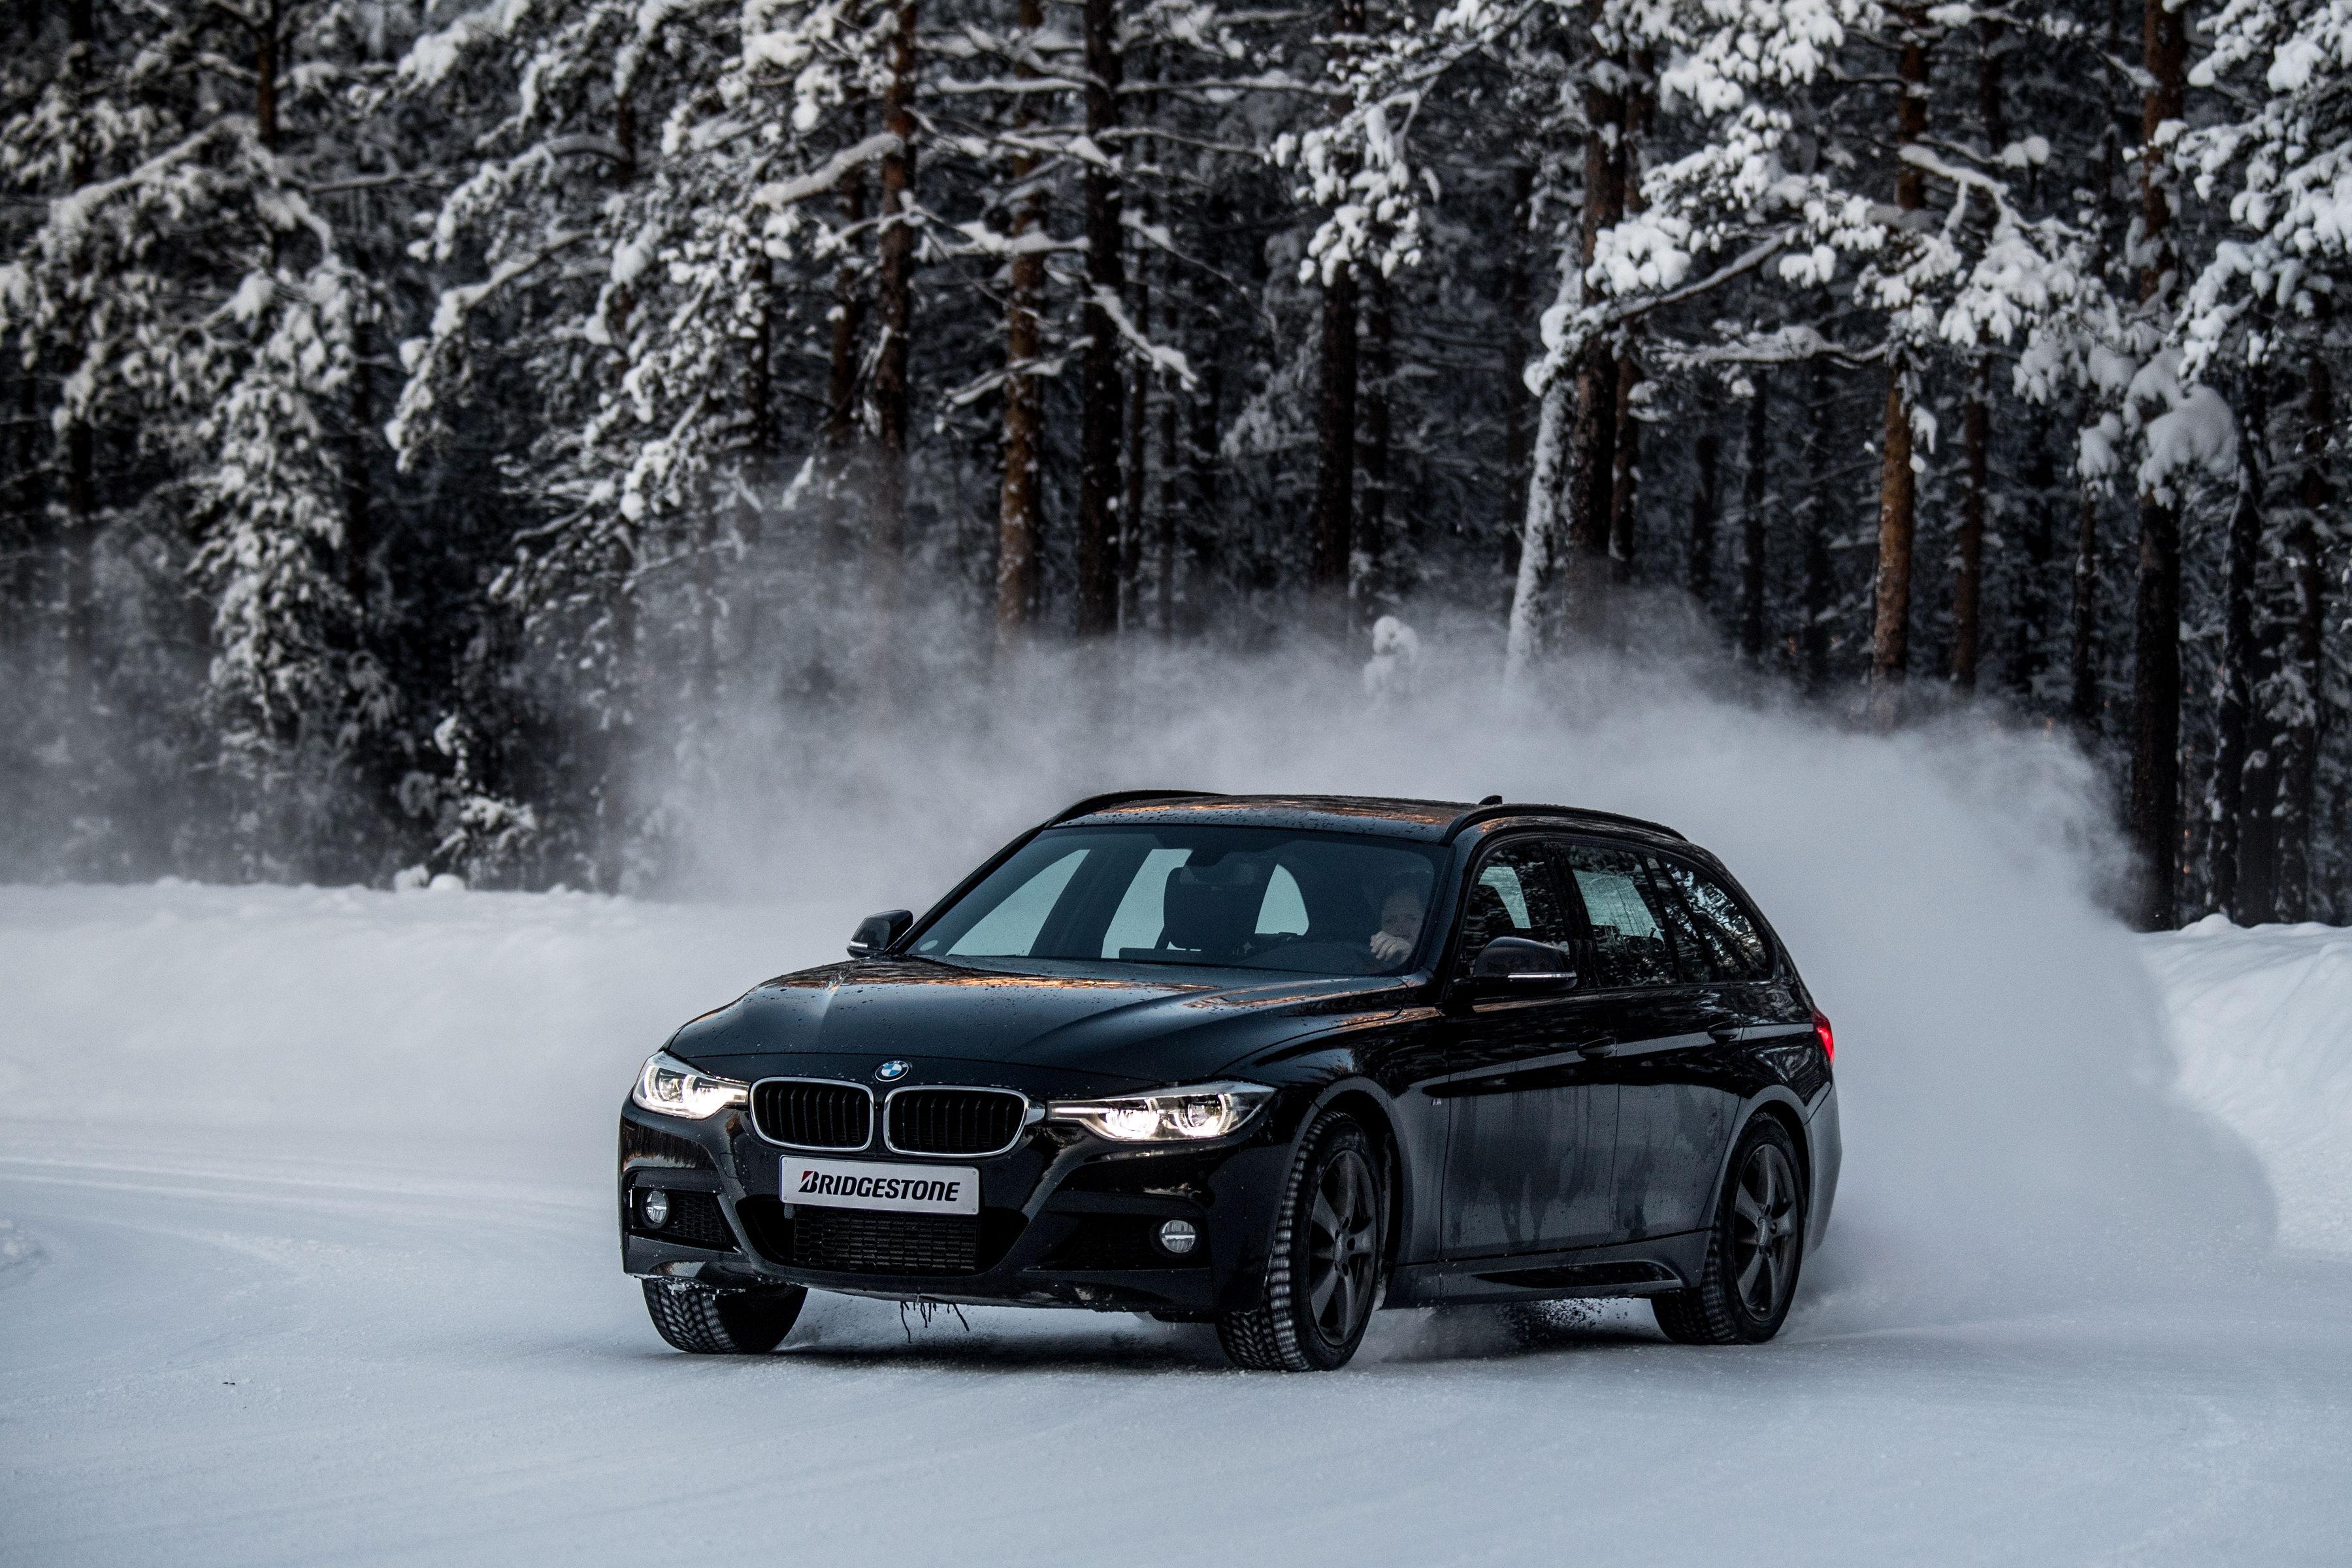 Noile anvelope de iarna Blizzak LM005 de la Bridgestone le ofera conducatorilor auto incredere pe drum